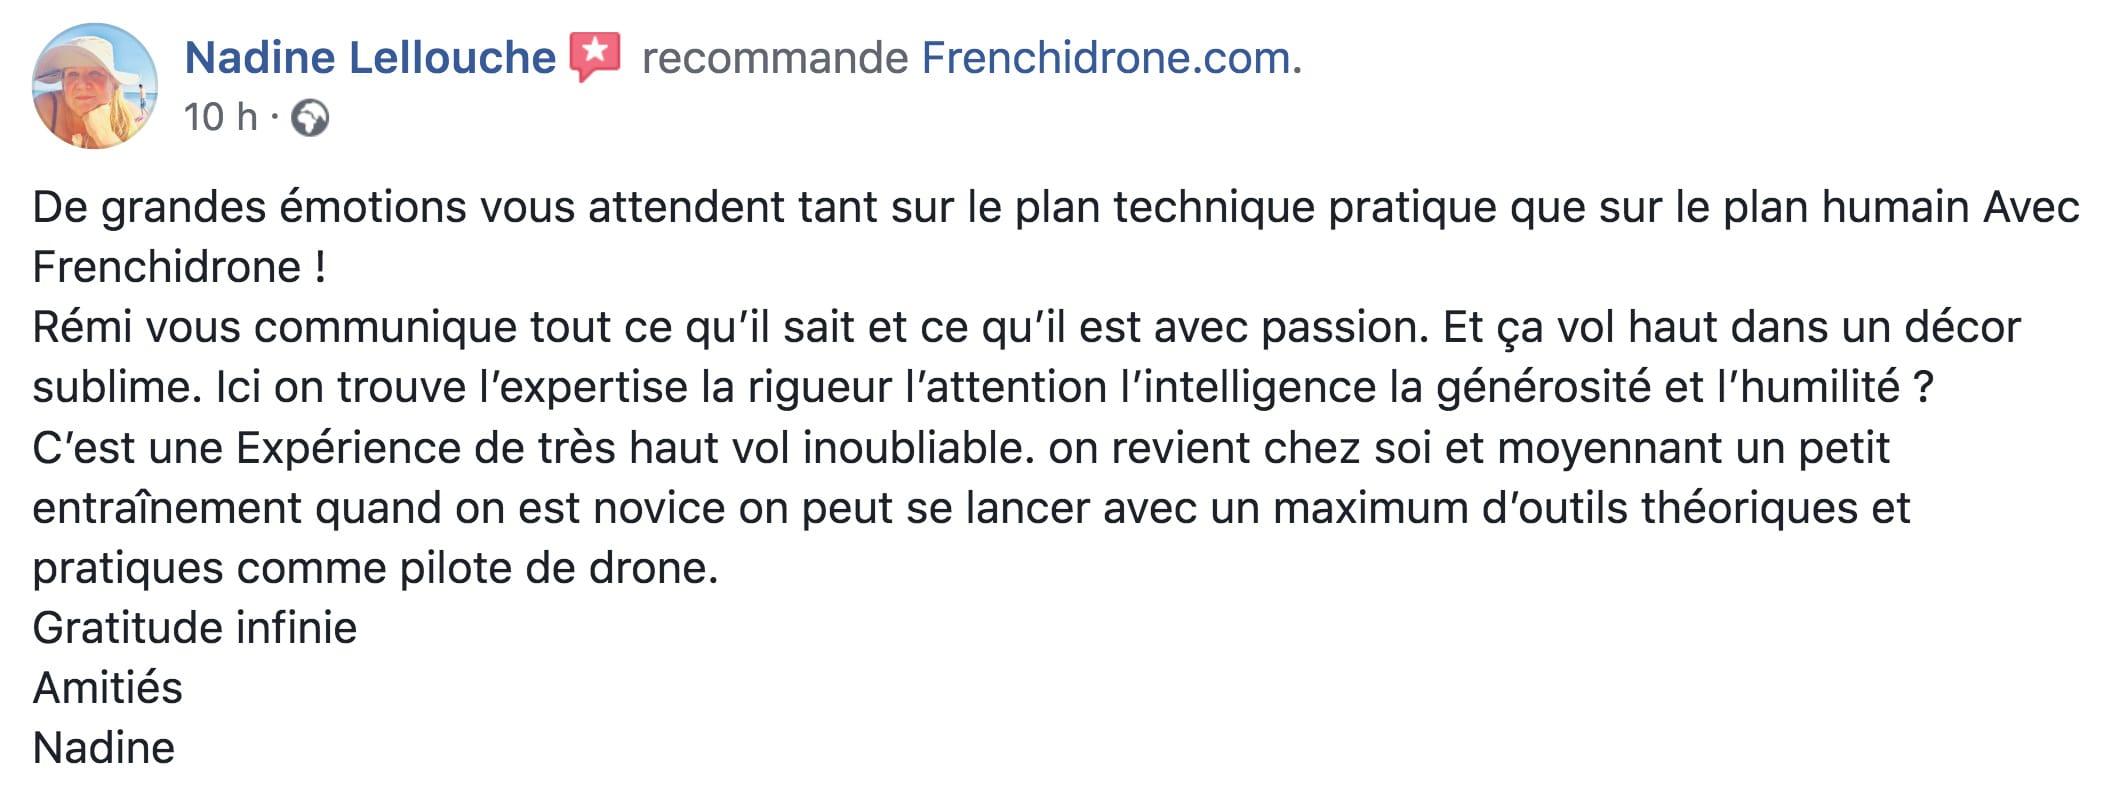 recommandation-Frenchidrone